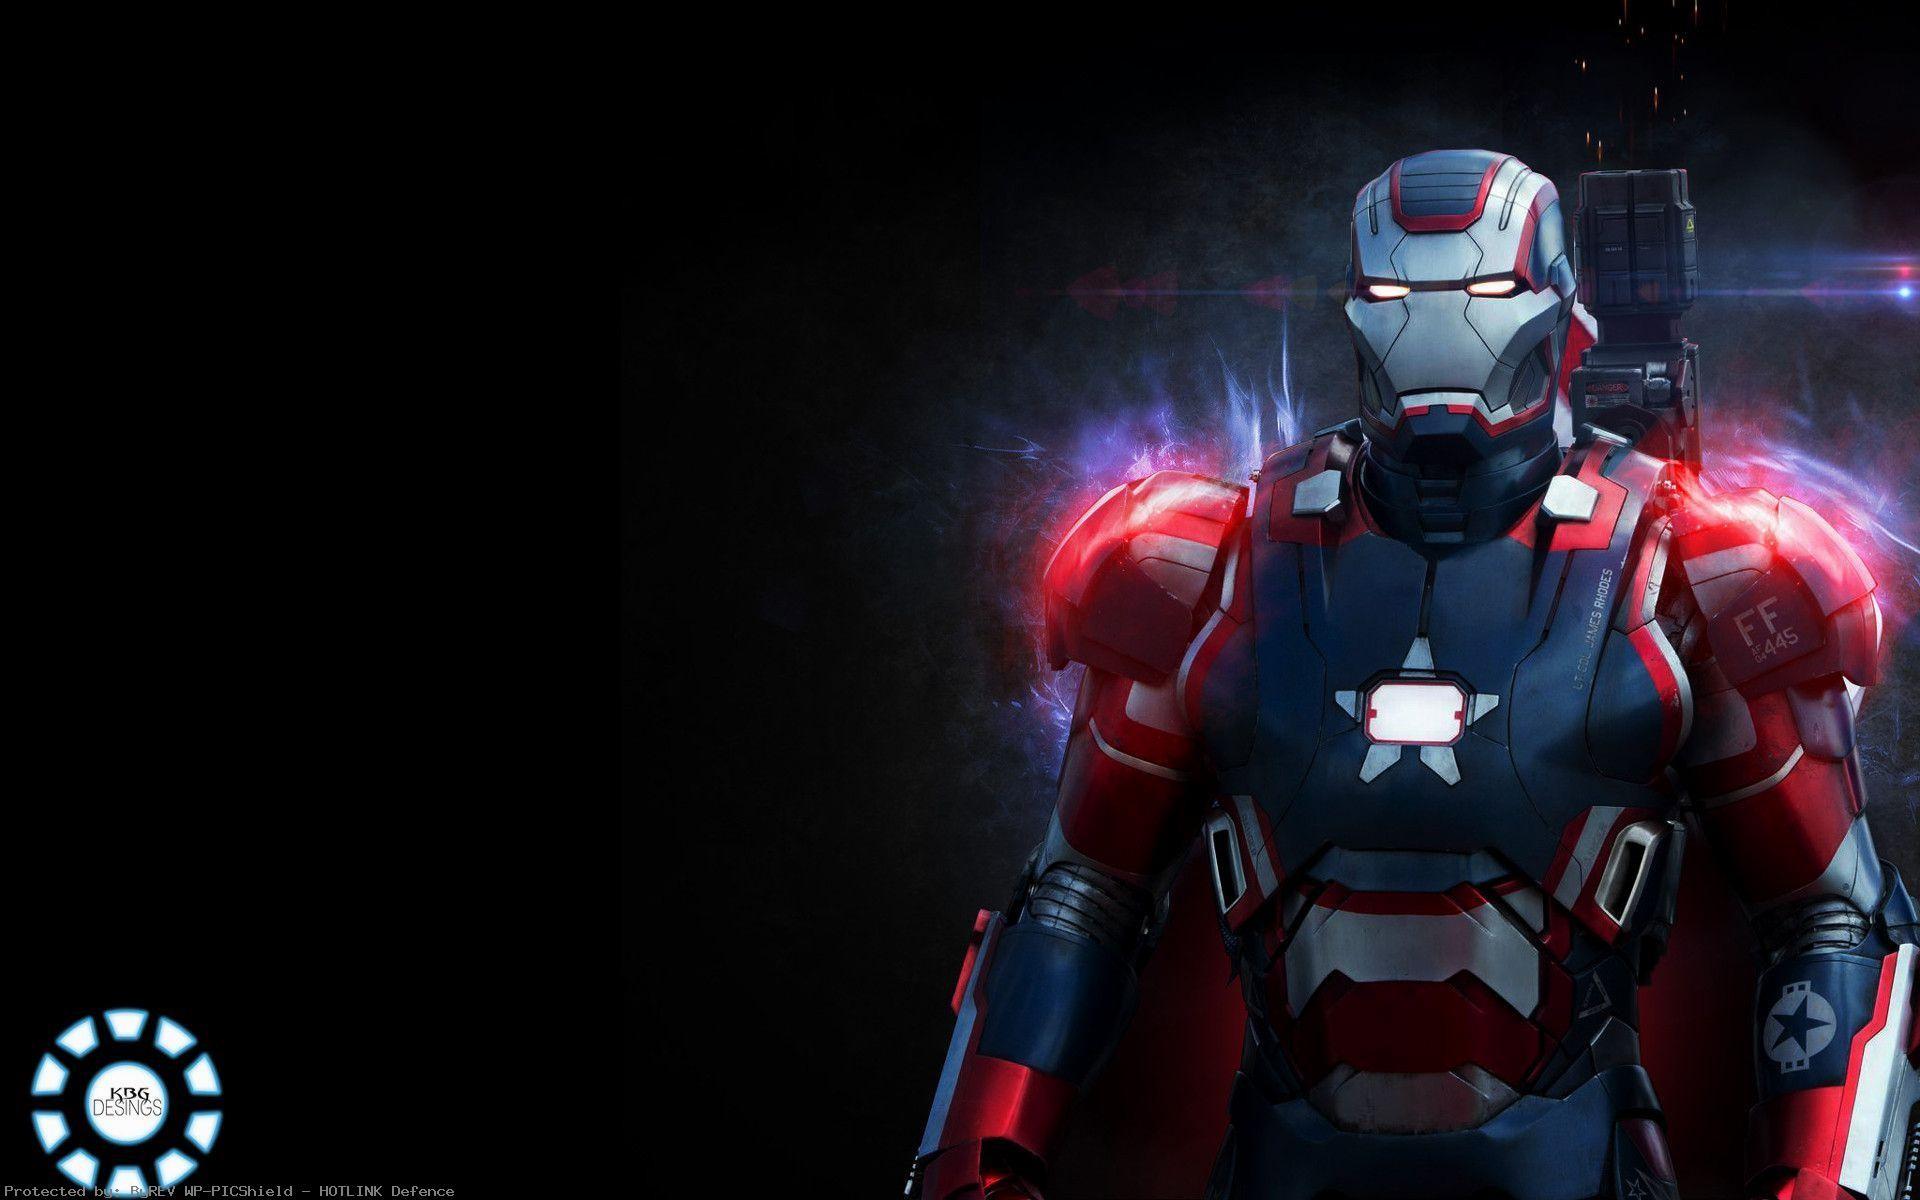 Iron-Man-HD-s-Backgrounds-wallpaper-wpt1006225